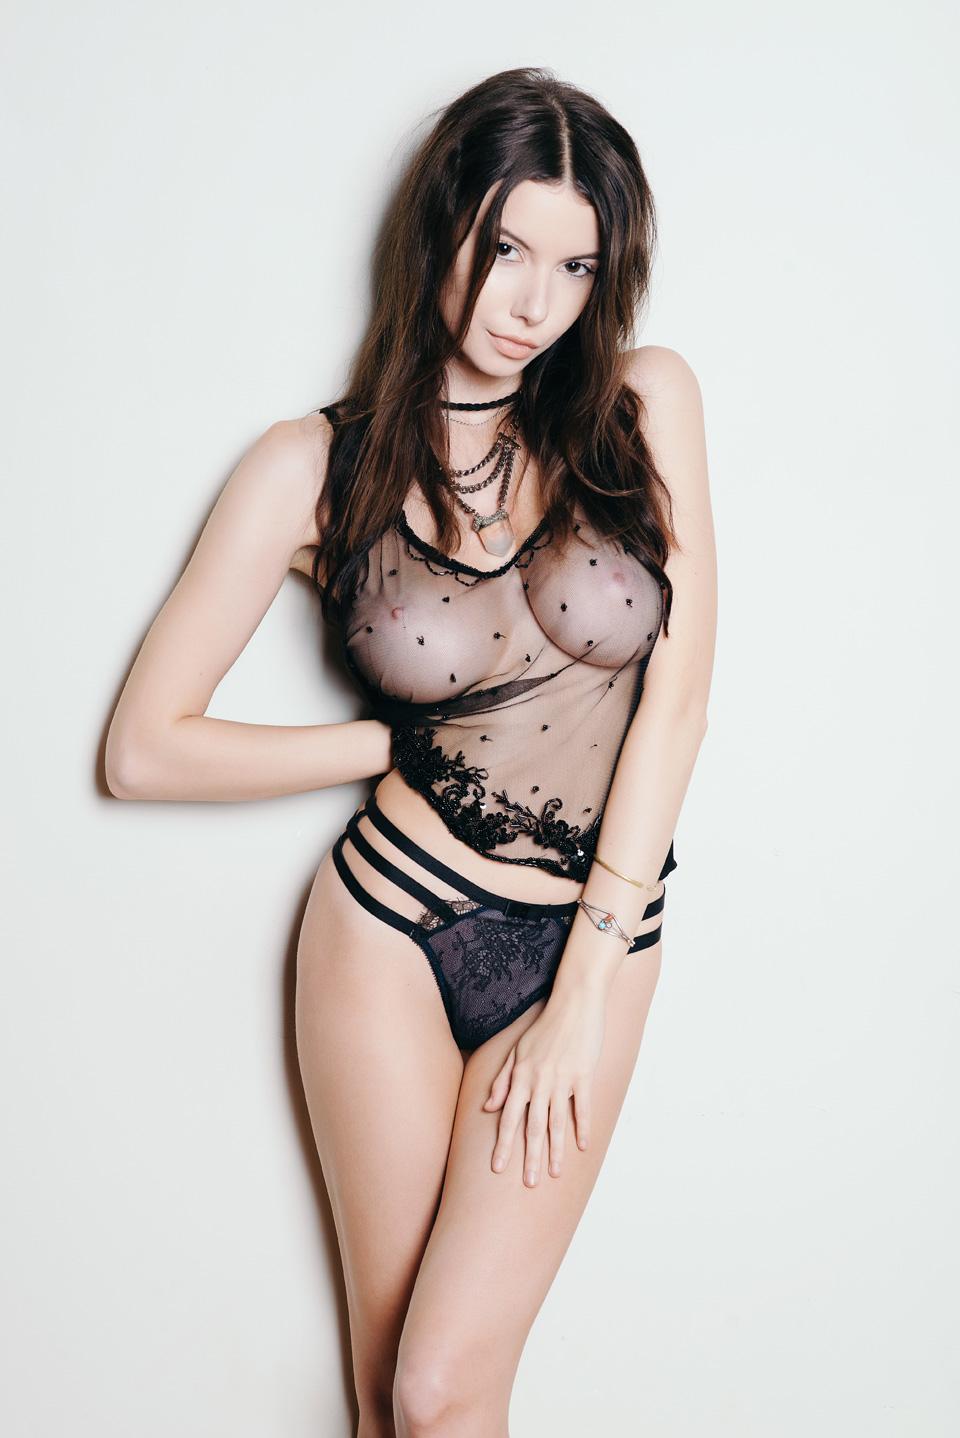 Alicia coppola nude casually